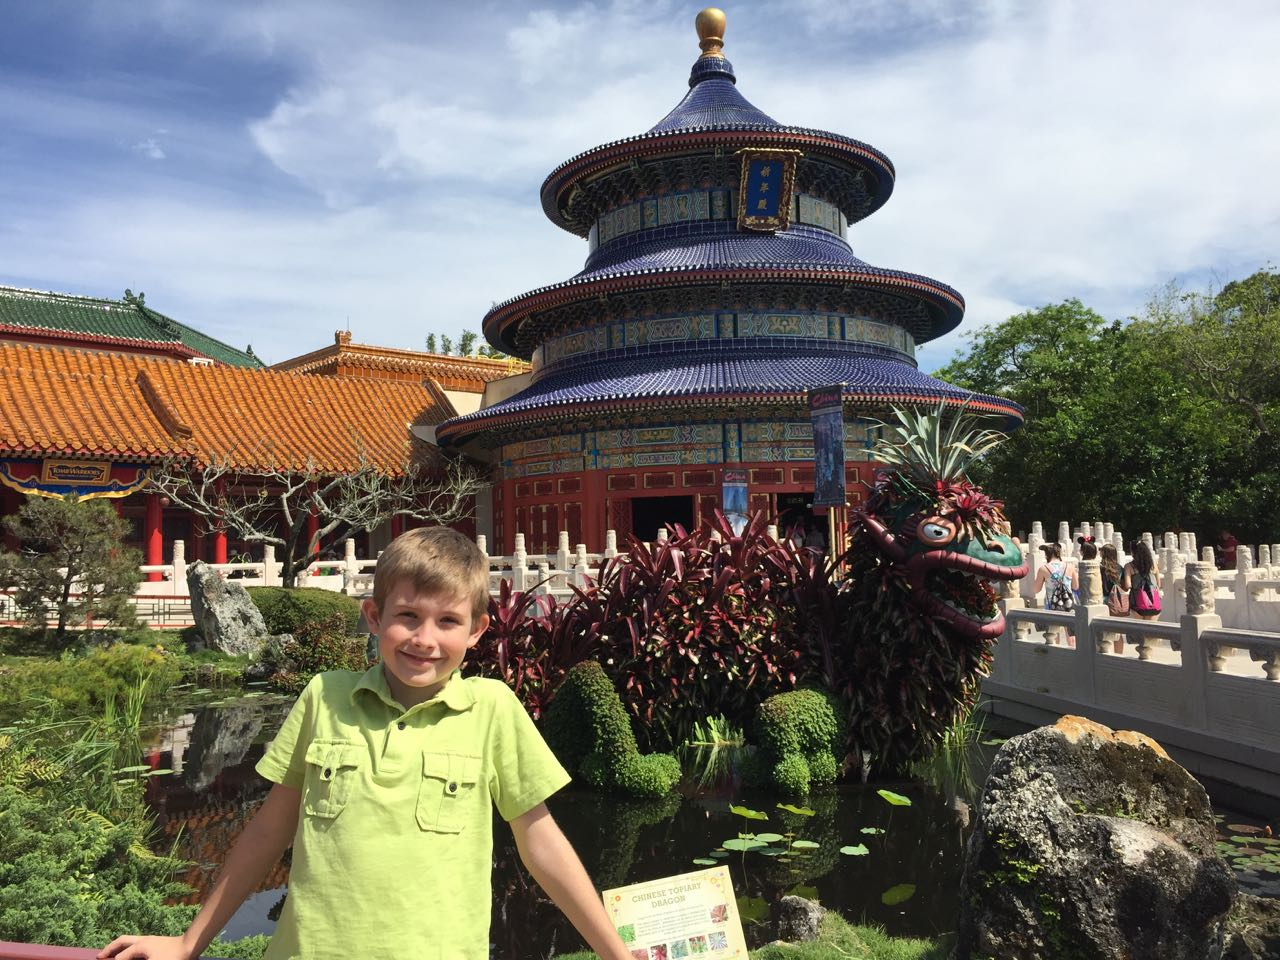 China Pavilion Epcot Flower & Garden 2016